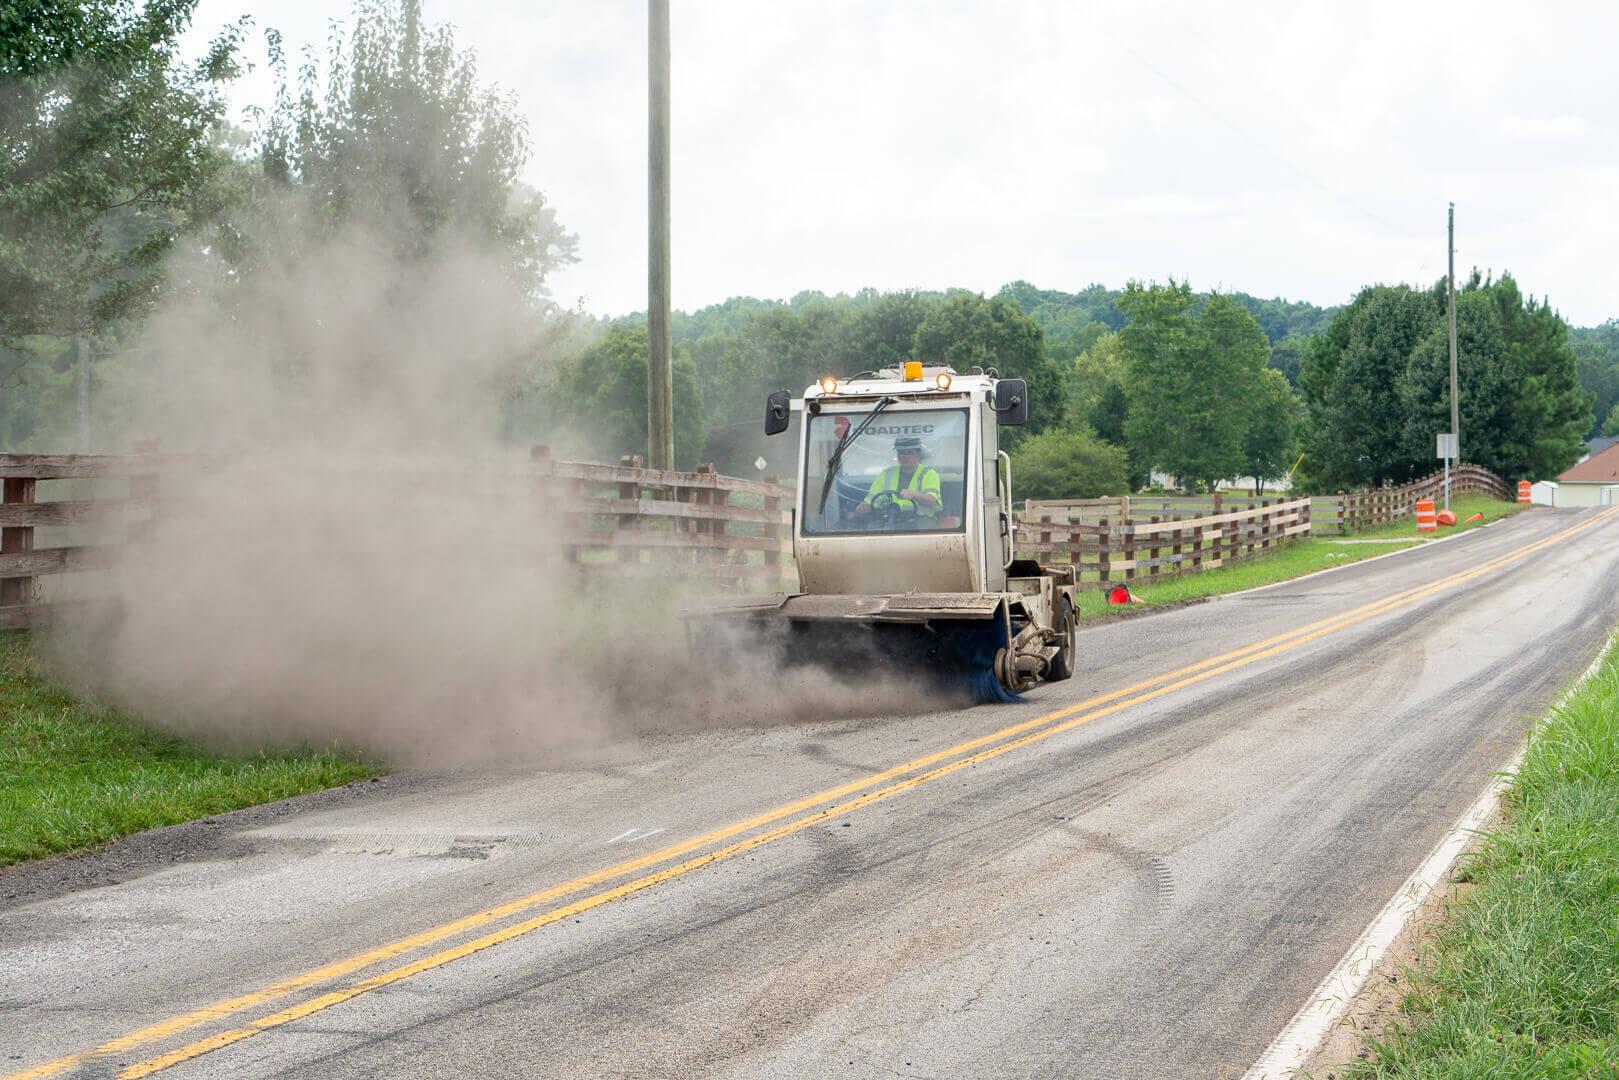 Roadtec FB-100 Asphalt Broom